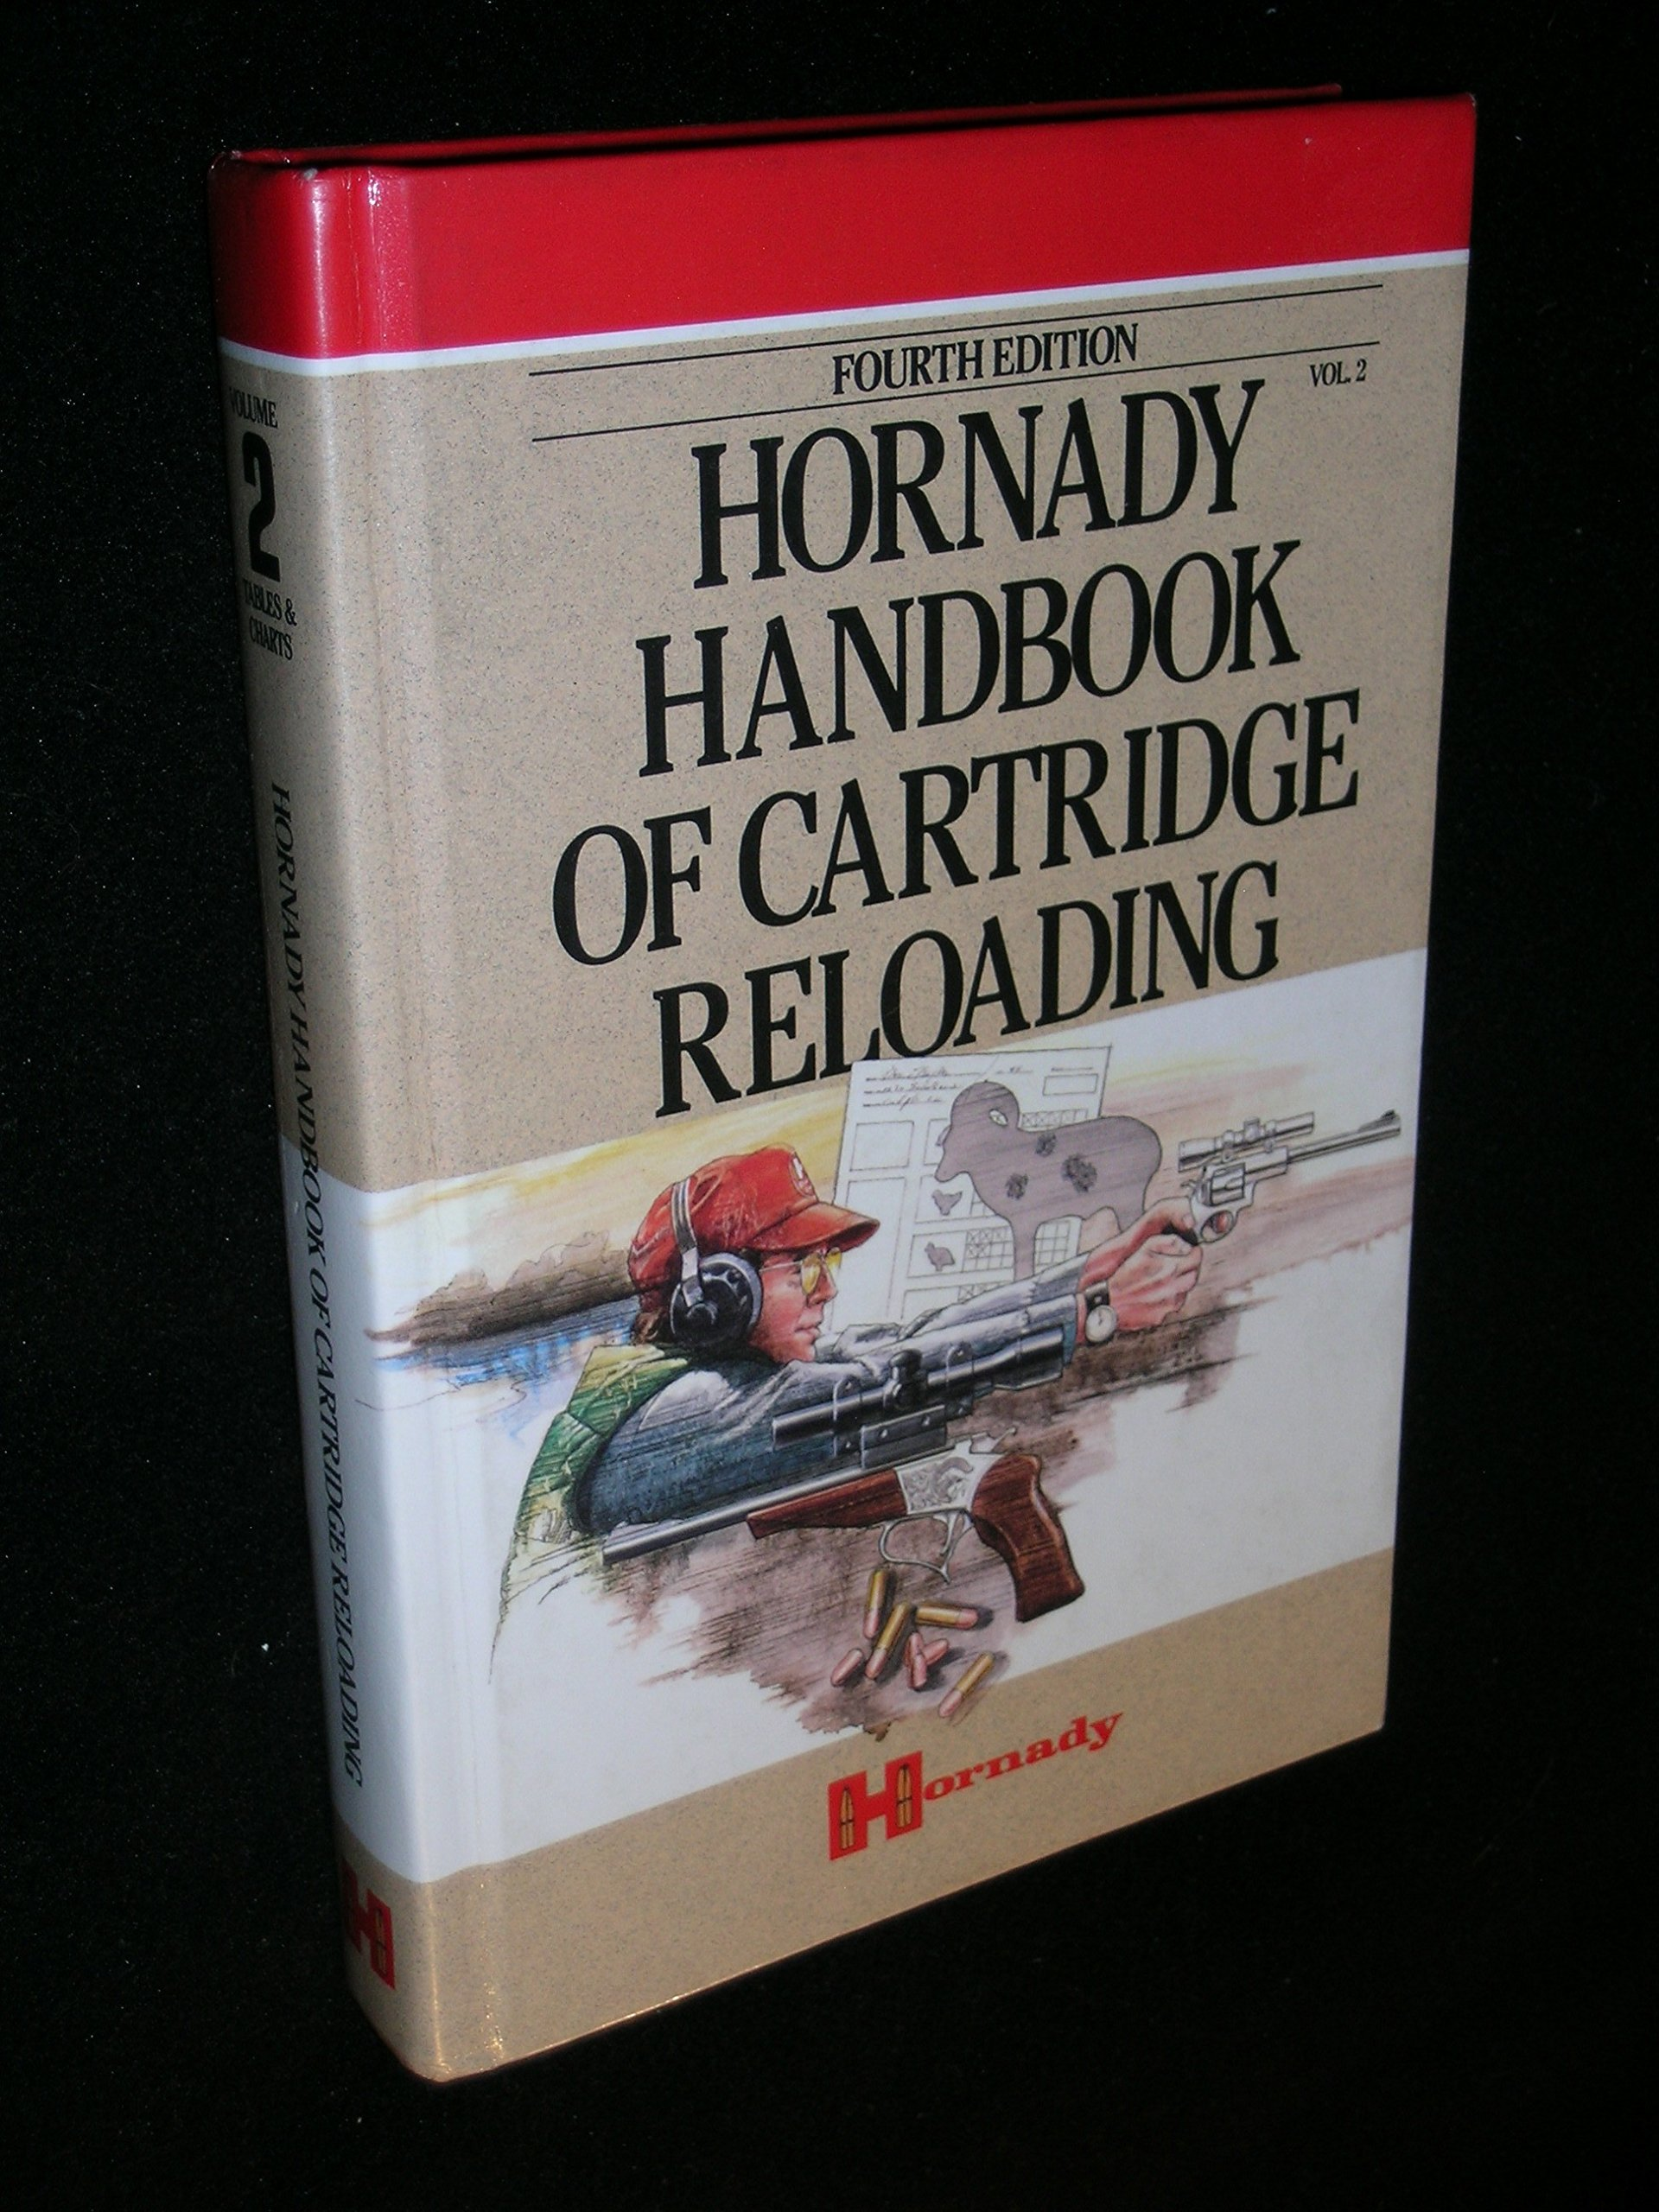 Hornady Handbook of Cartridge Reloading Vol 2 4th Edition